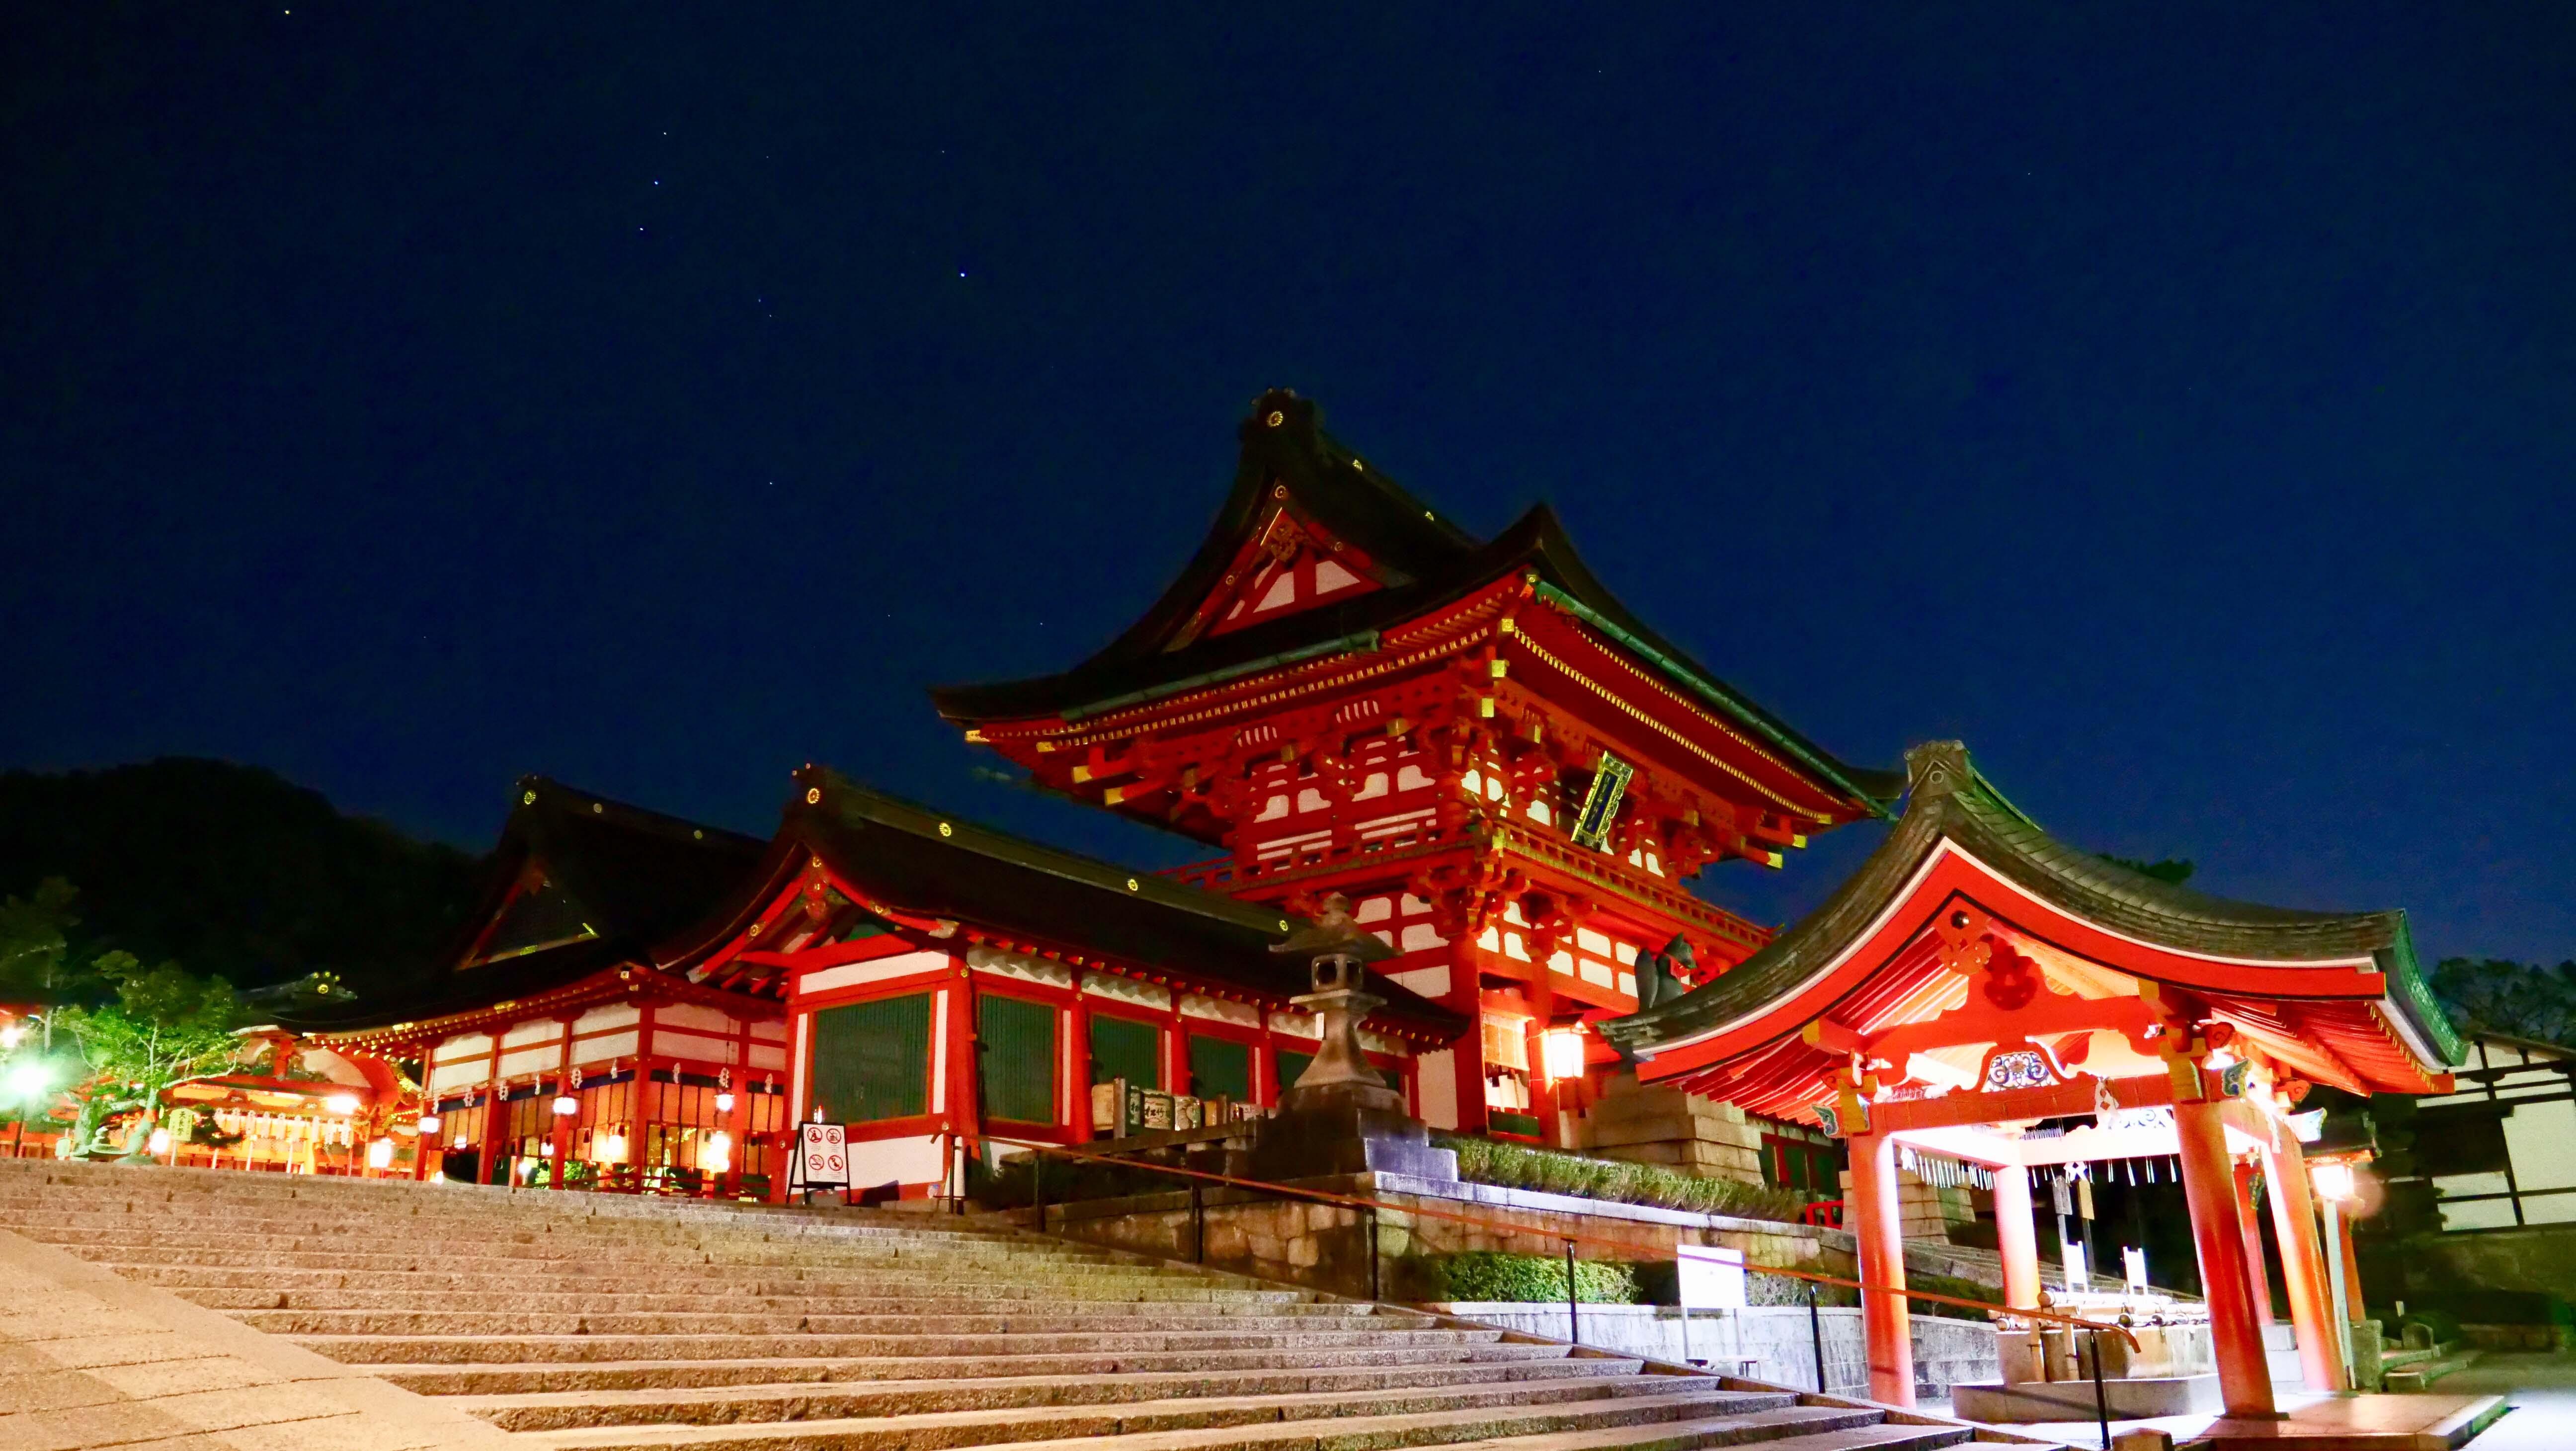 Le sanctuaire de Fushimi Inari © LM